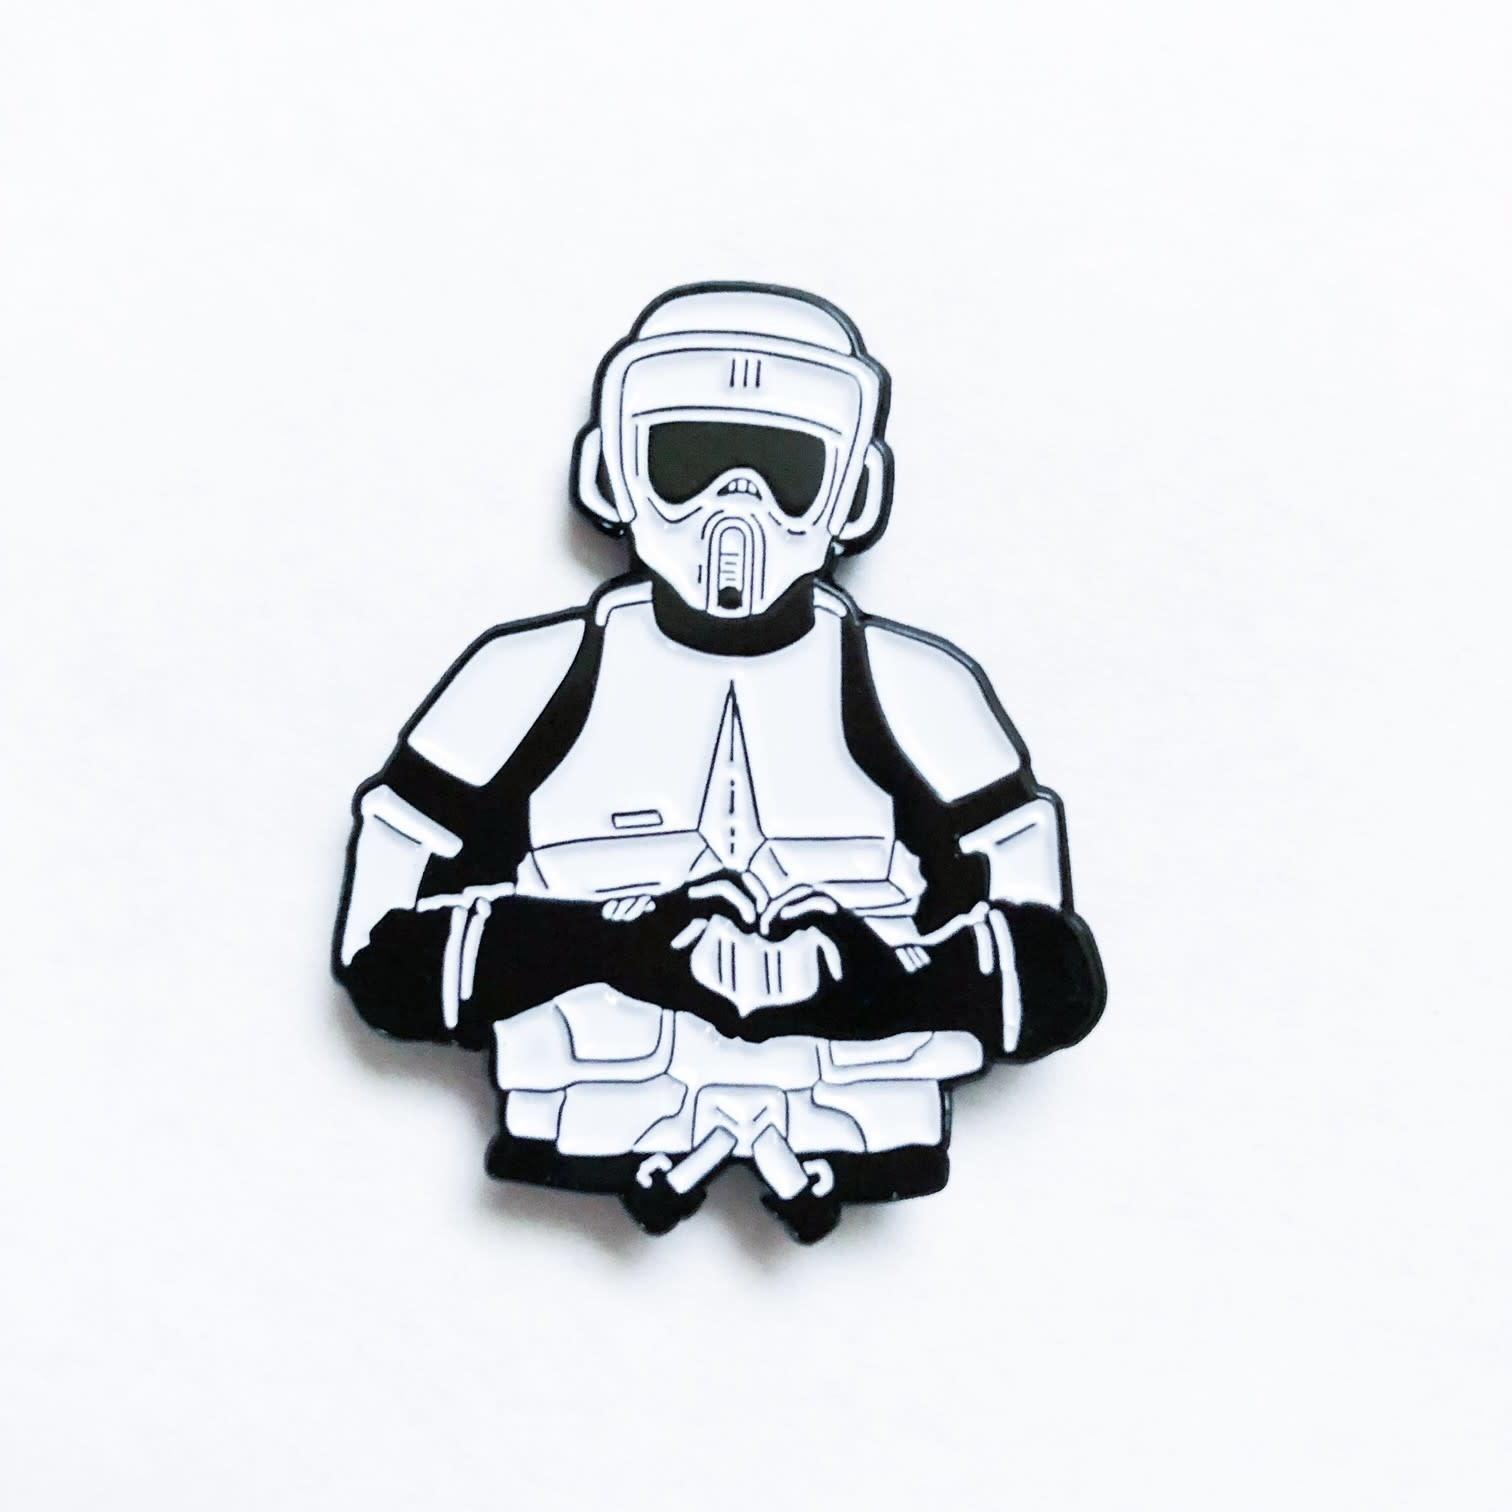 DKE Star Wars: I heart U - Biker Scout Pin